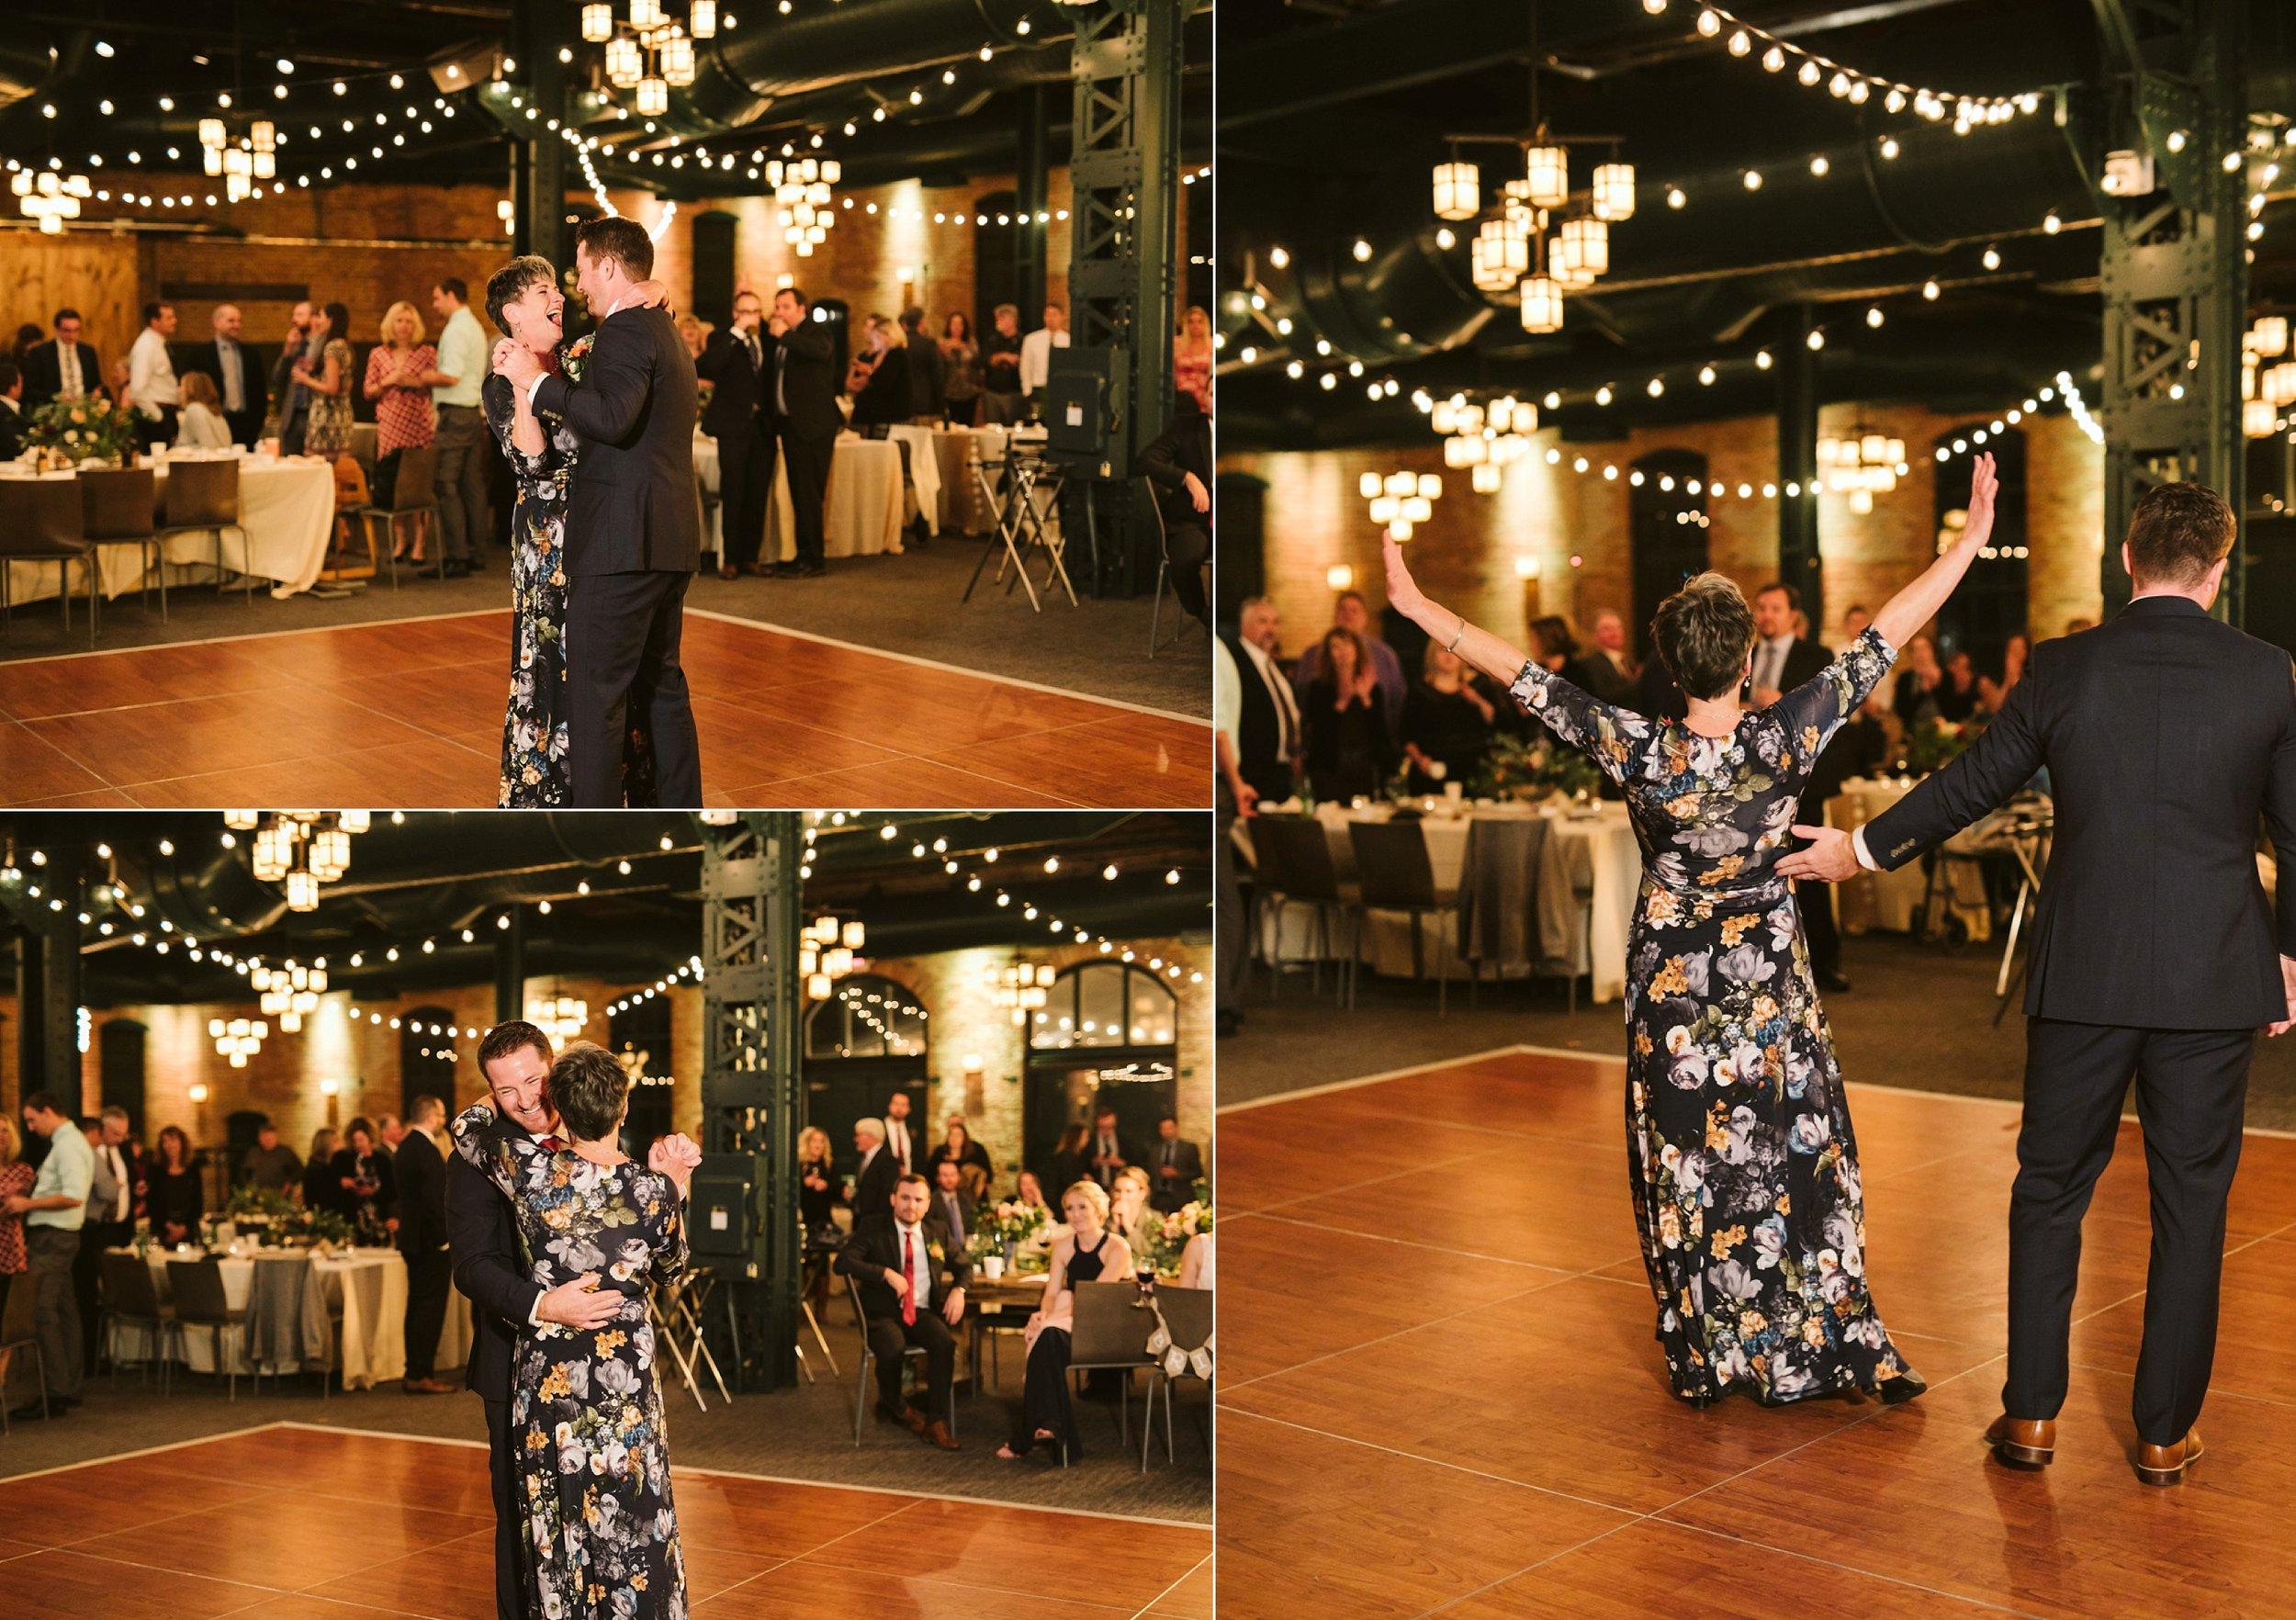 Nicollet-Island-Pavilion-Minneapolis-September-Coral-Navy-Wedding-176.jpg